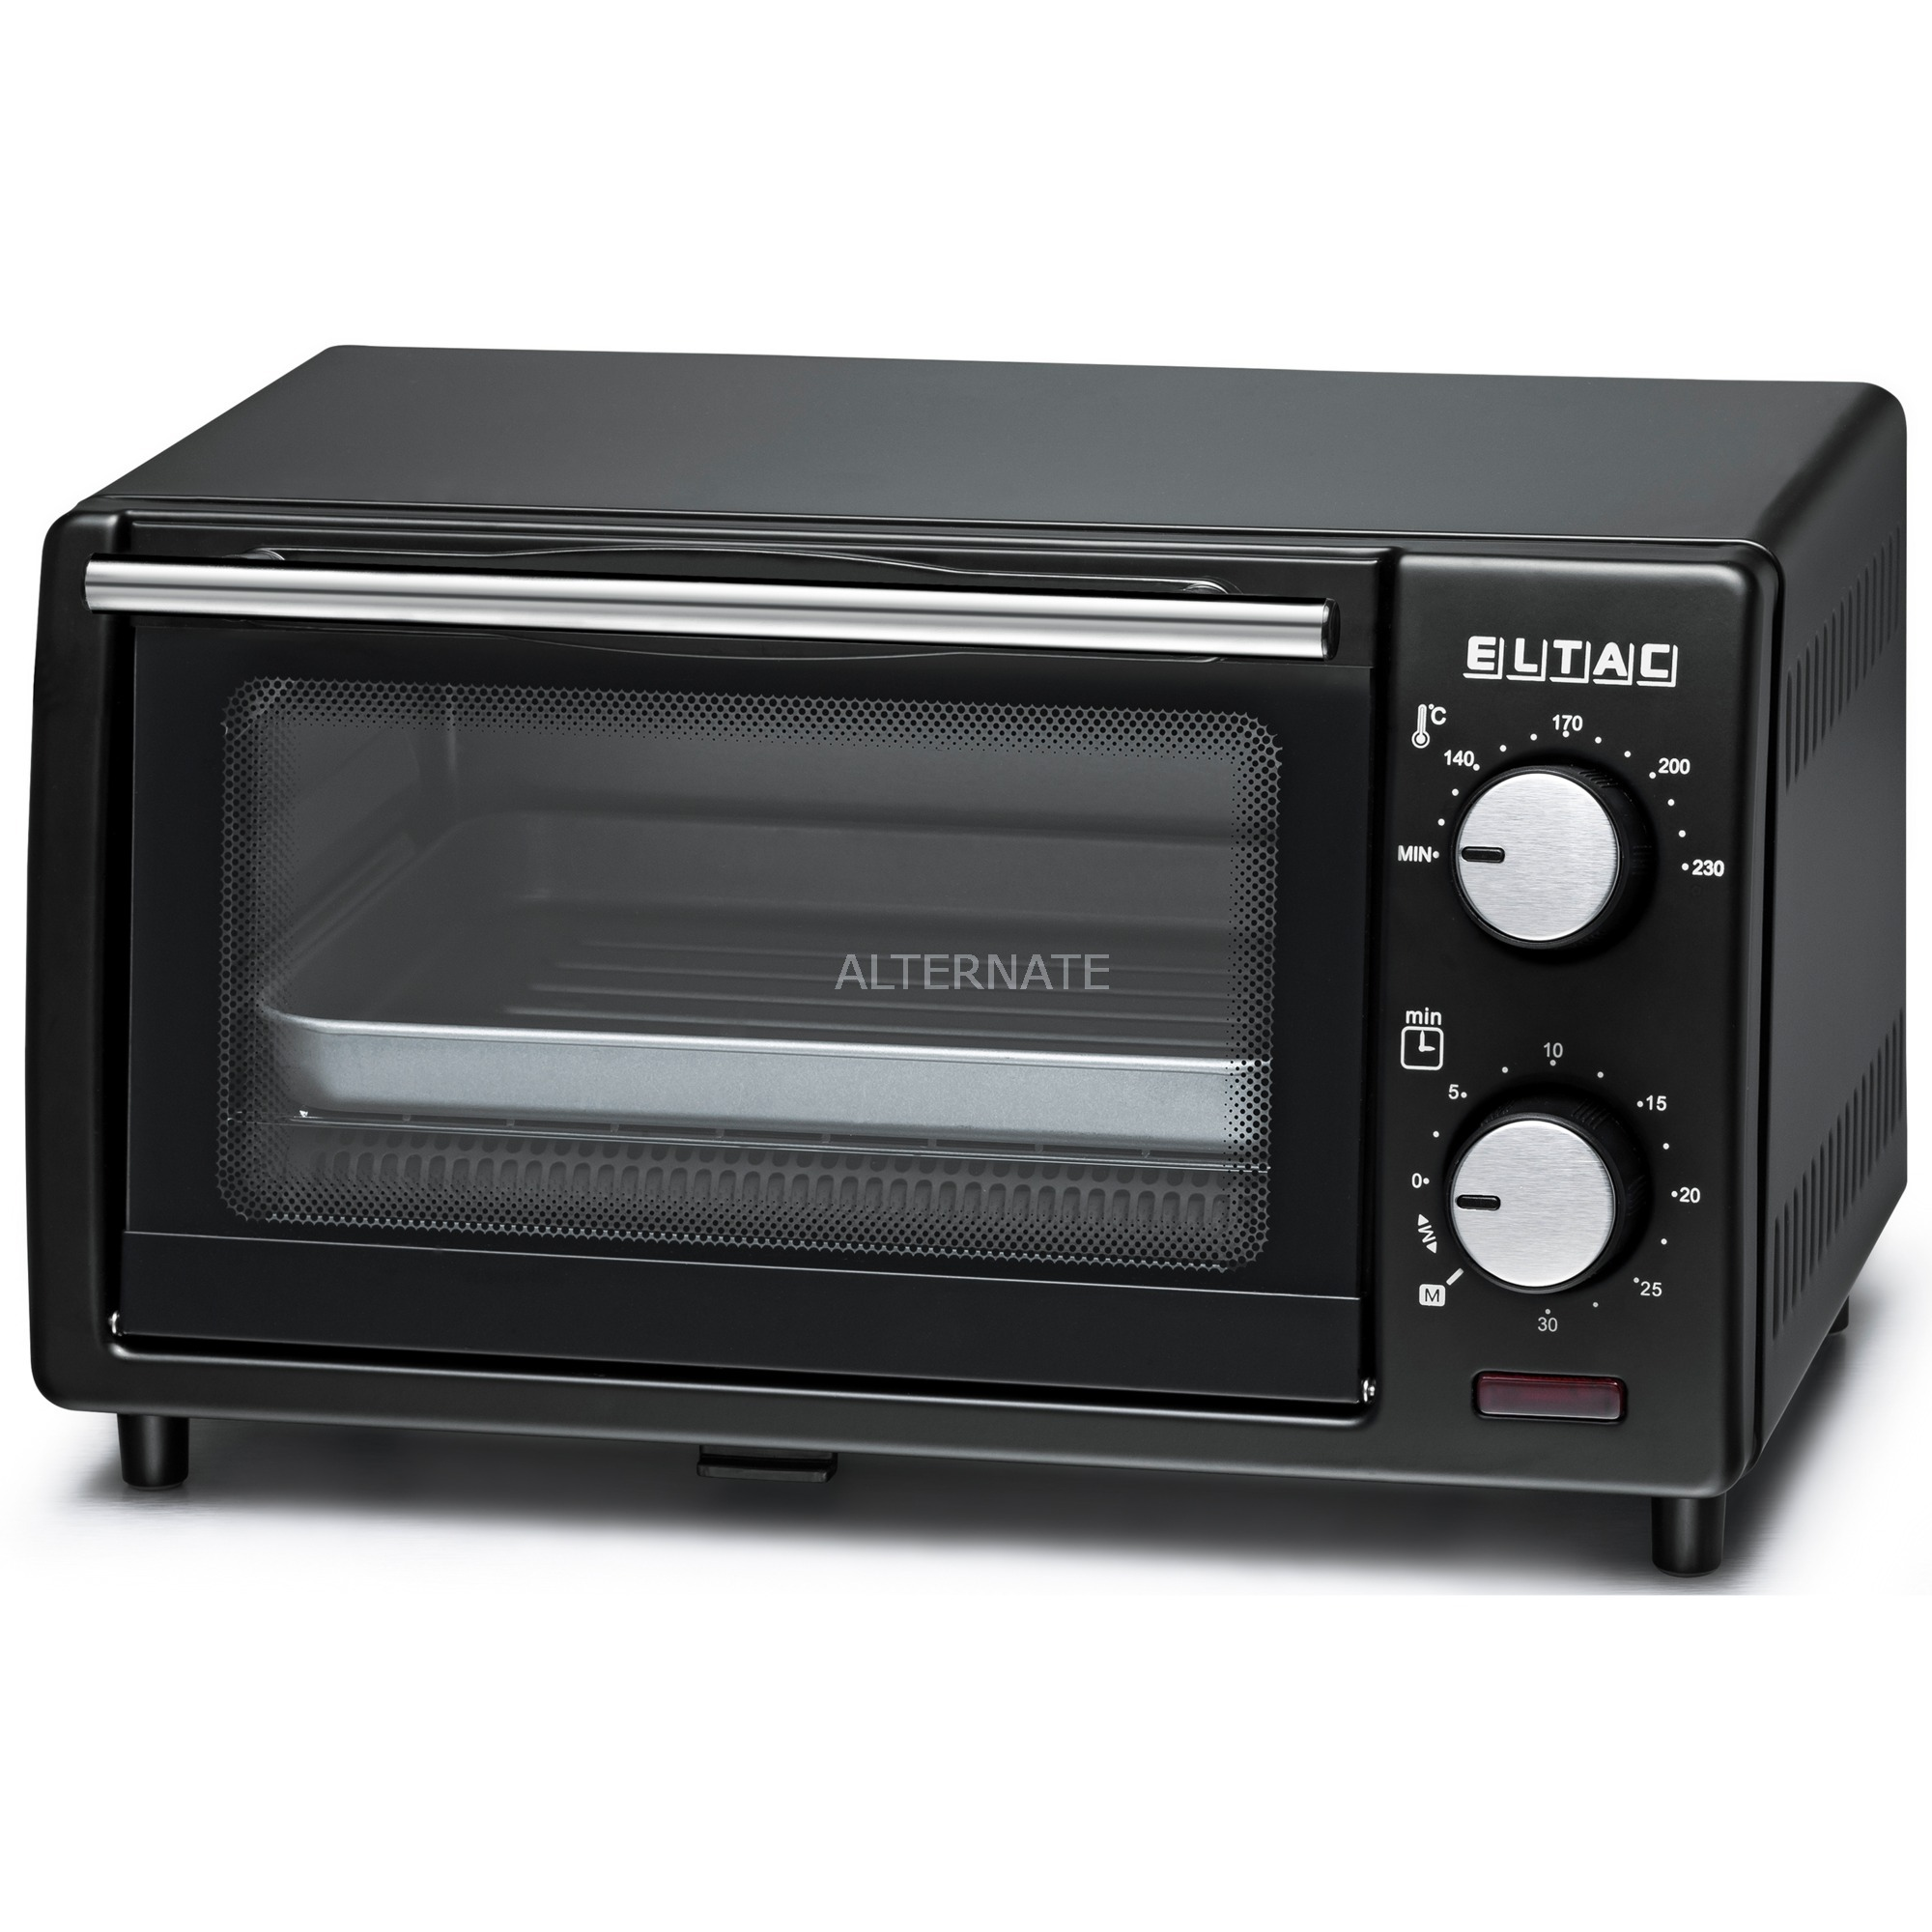 ELTAC RG 9, Mini horno